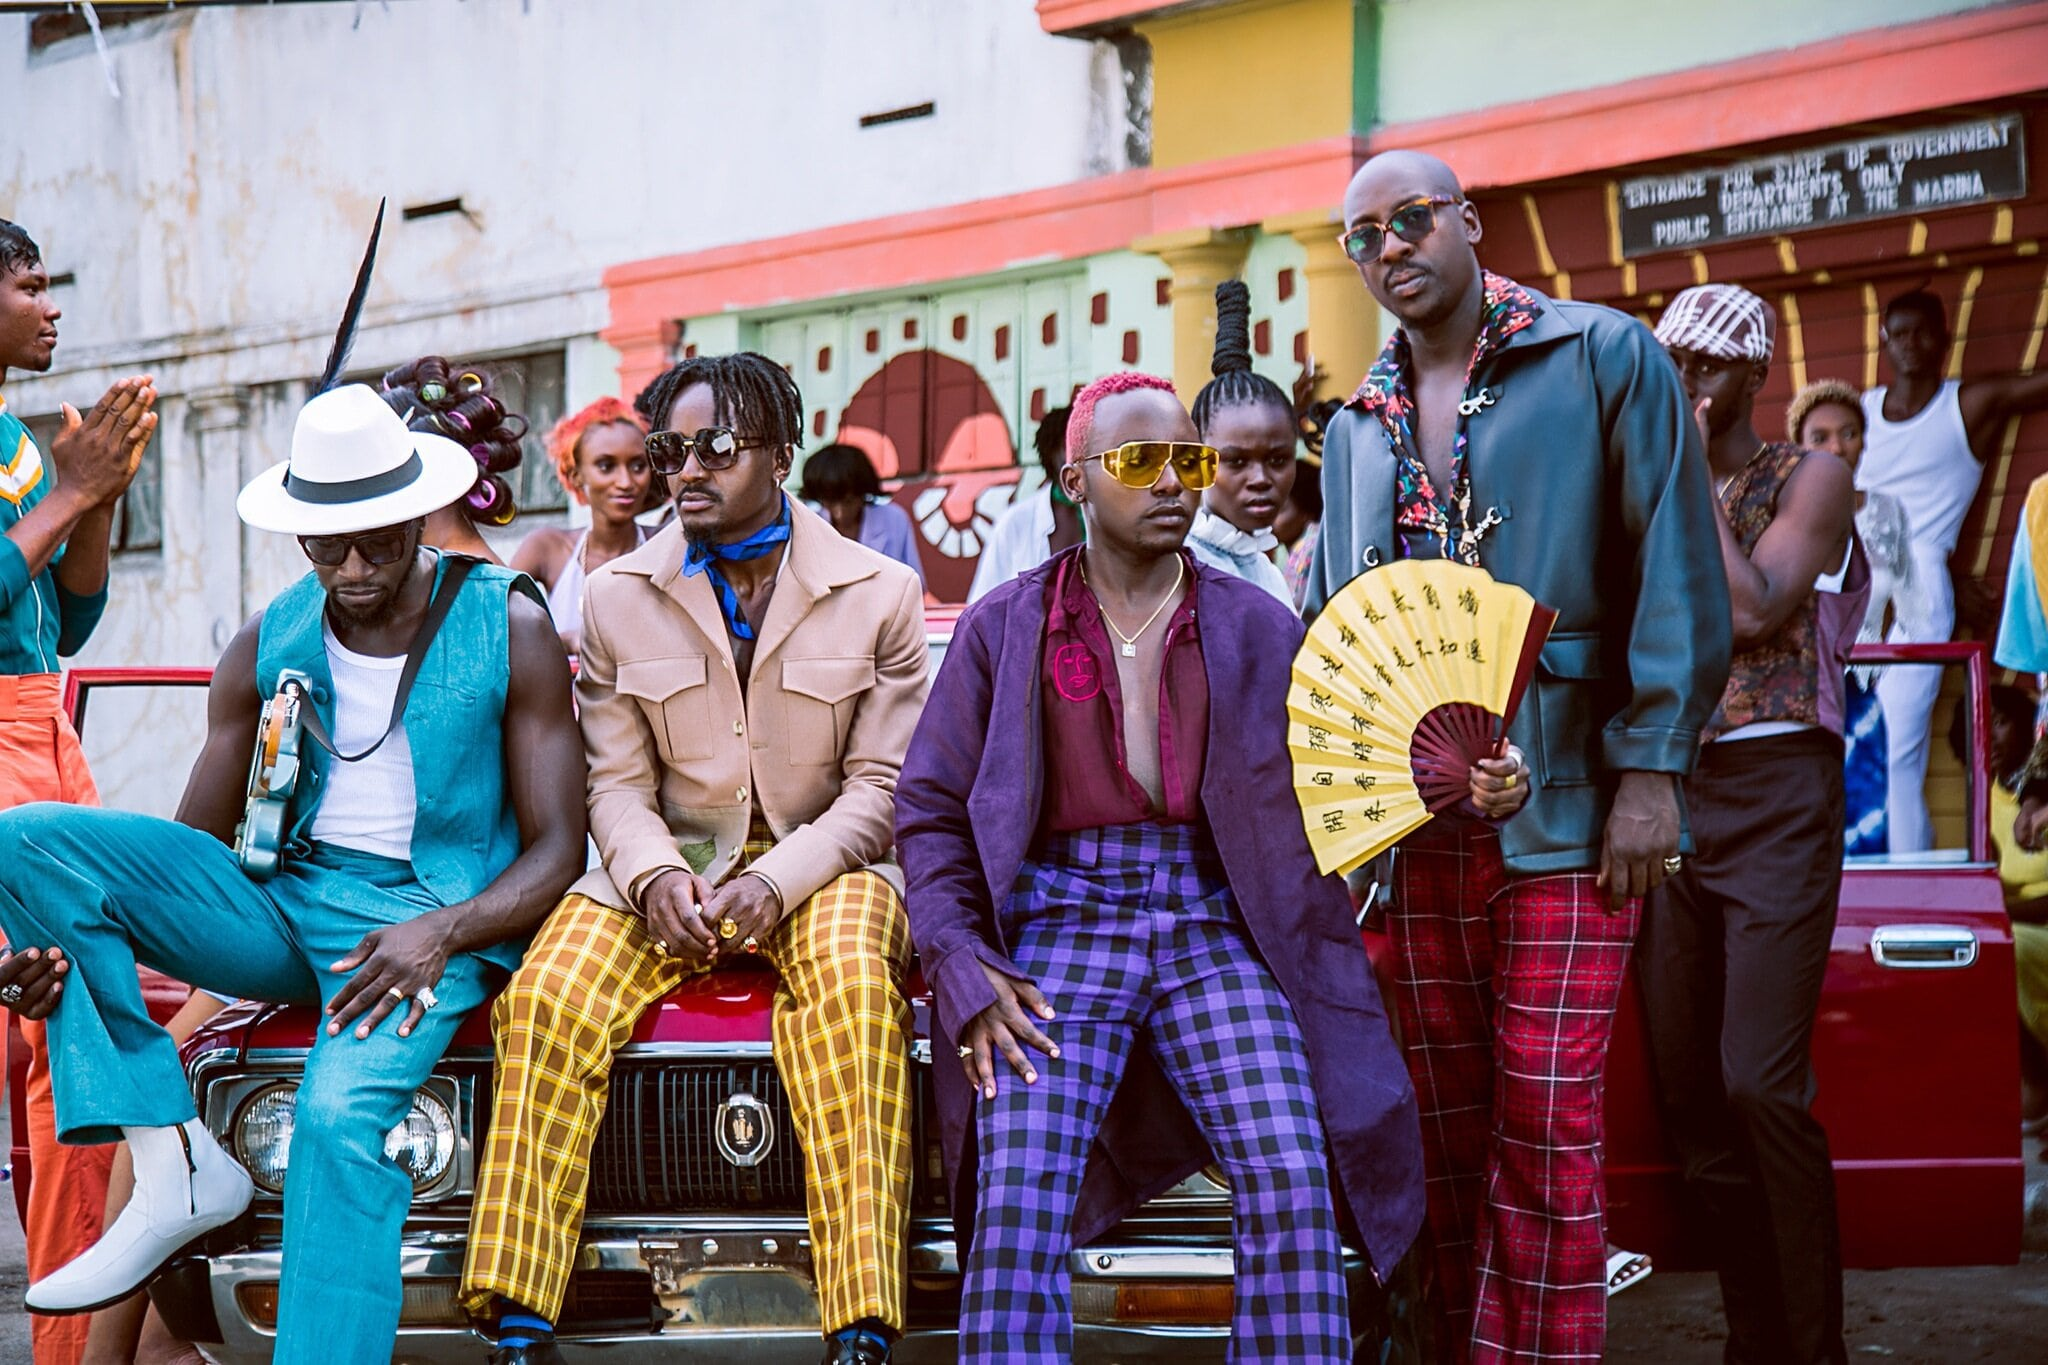 Sauti Sol - Suzanna [Official Video] - Février 2020 - Kenya - Coqlakour